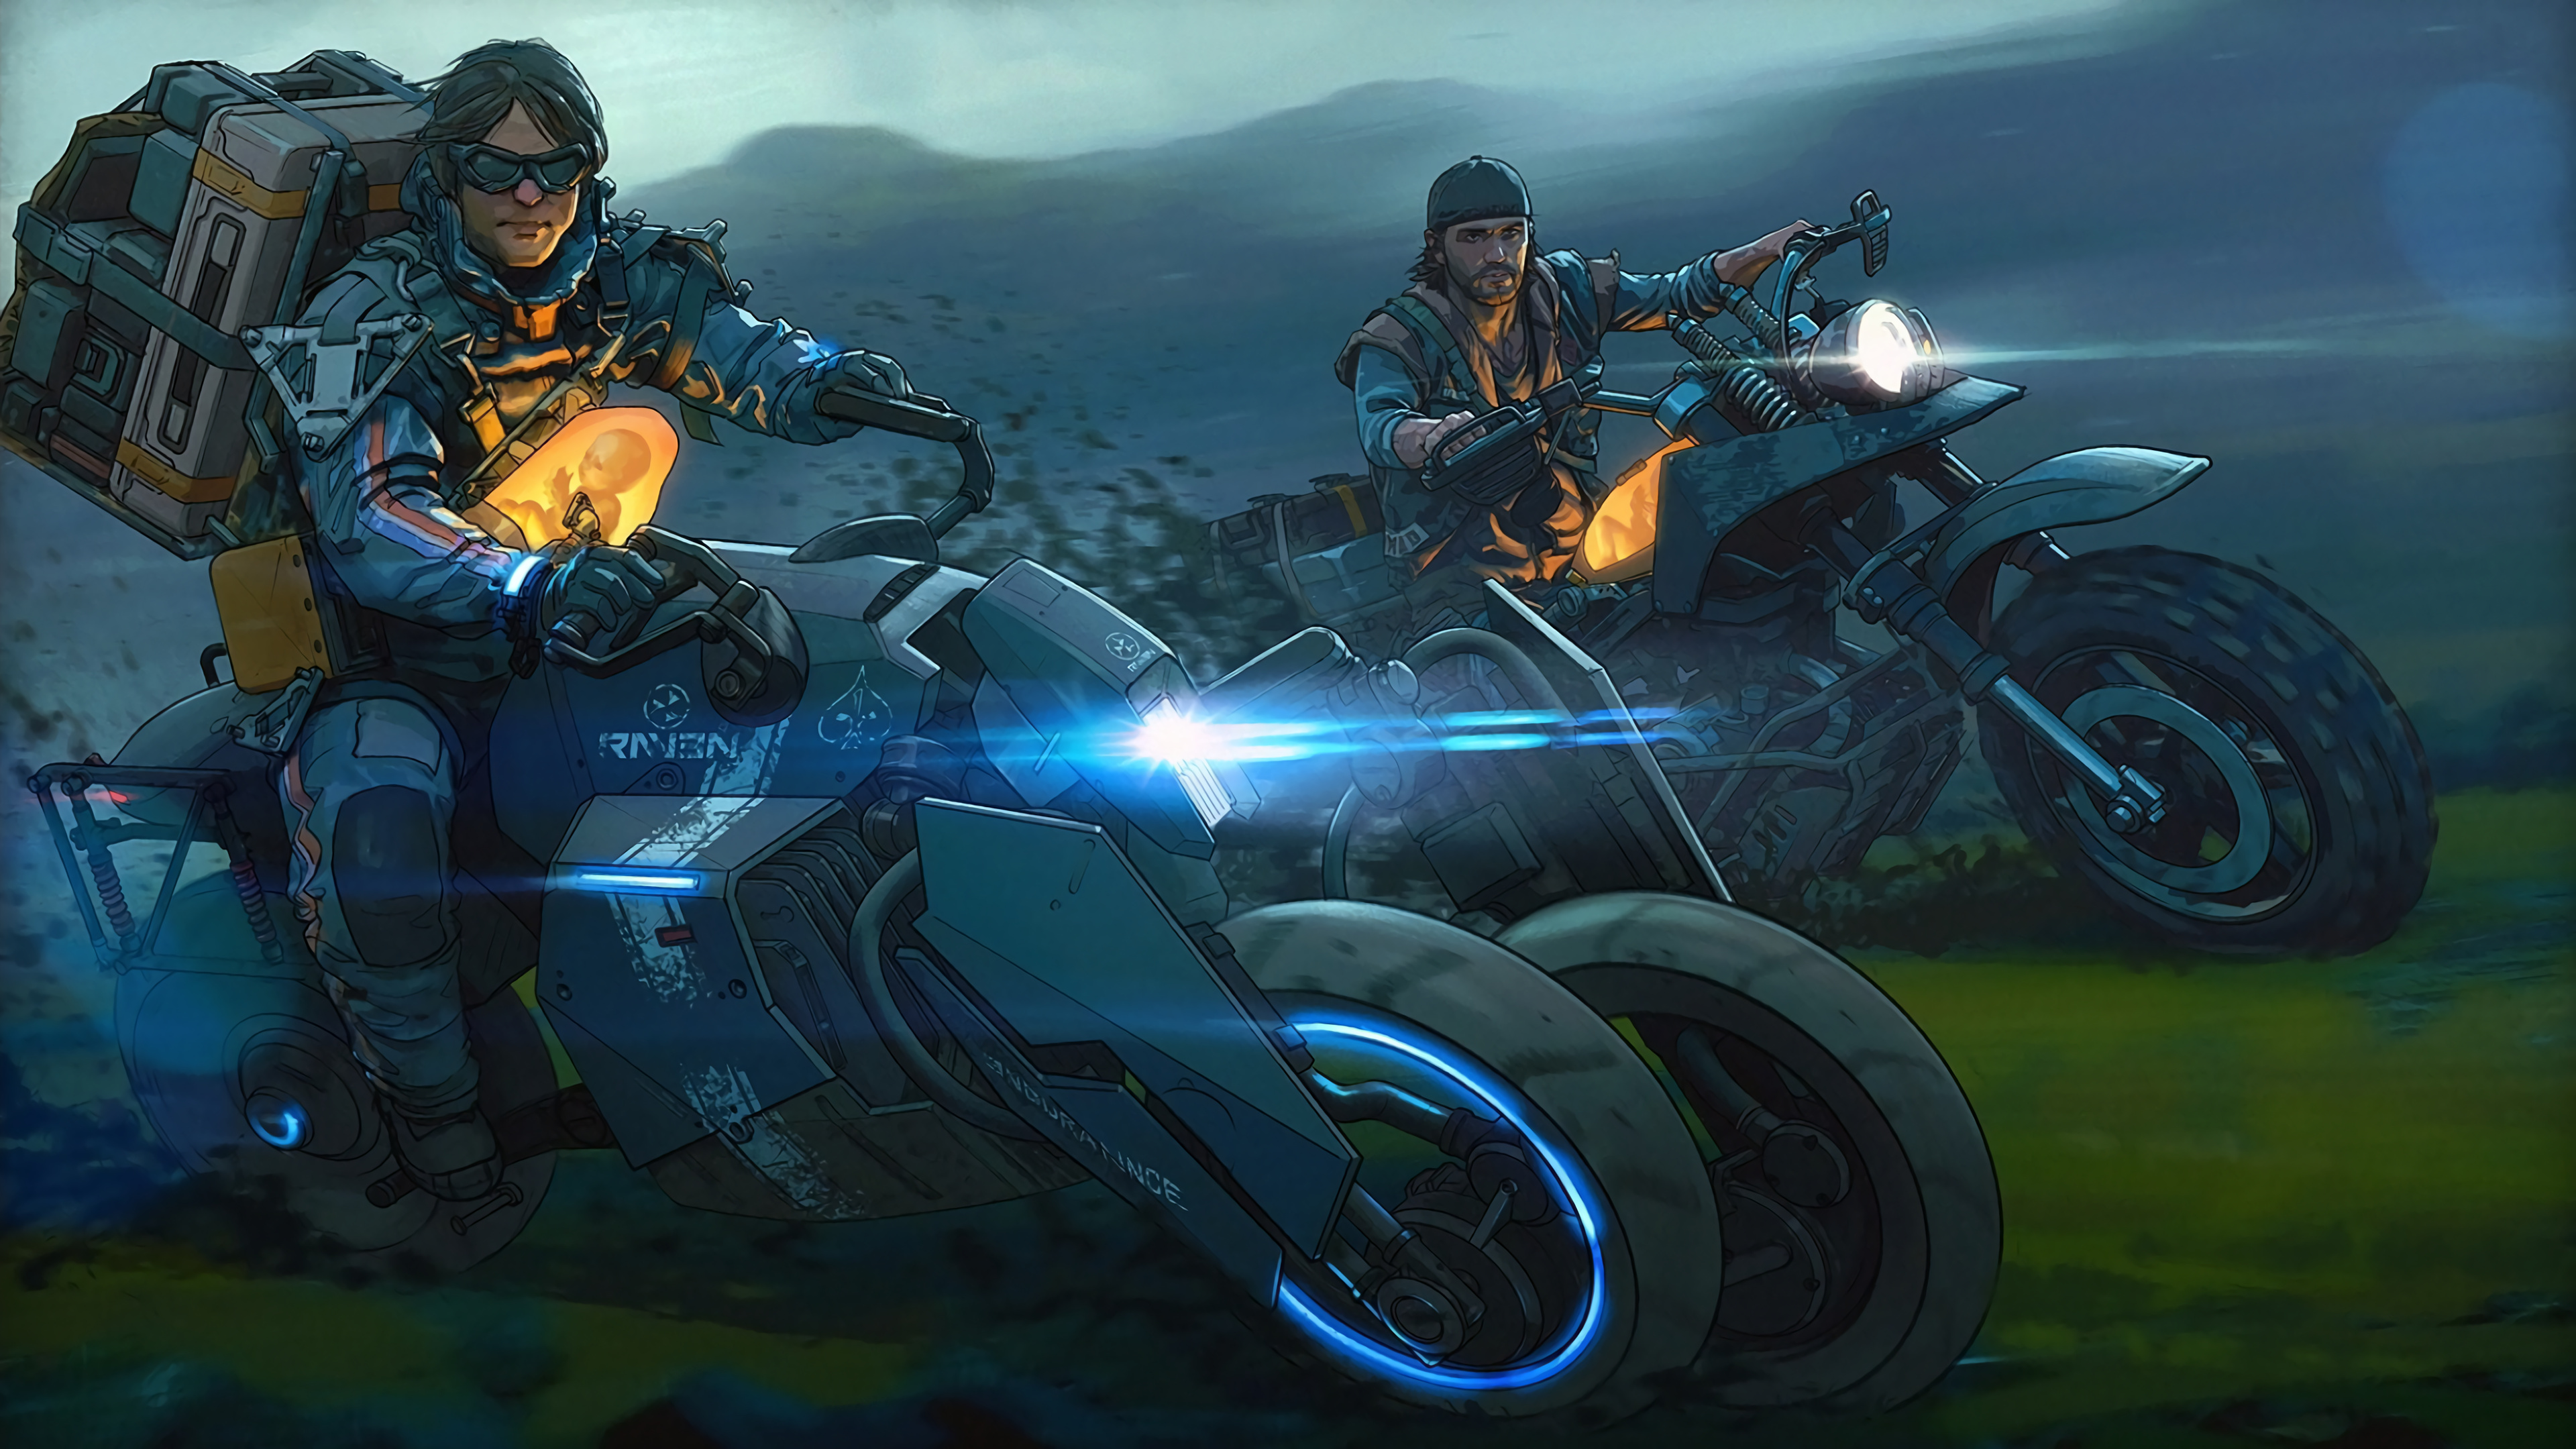 Death Stranding Motorcycle Days Gone 4K Wallpaper 51369 3840x2160